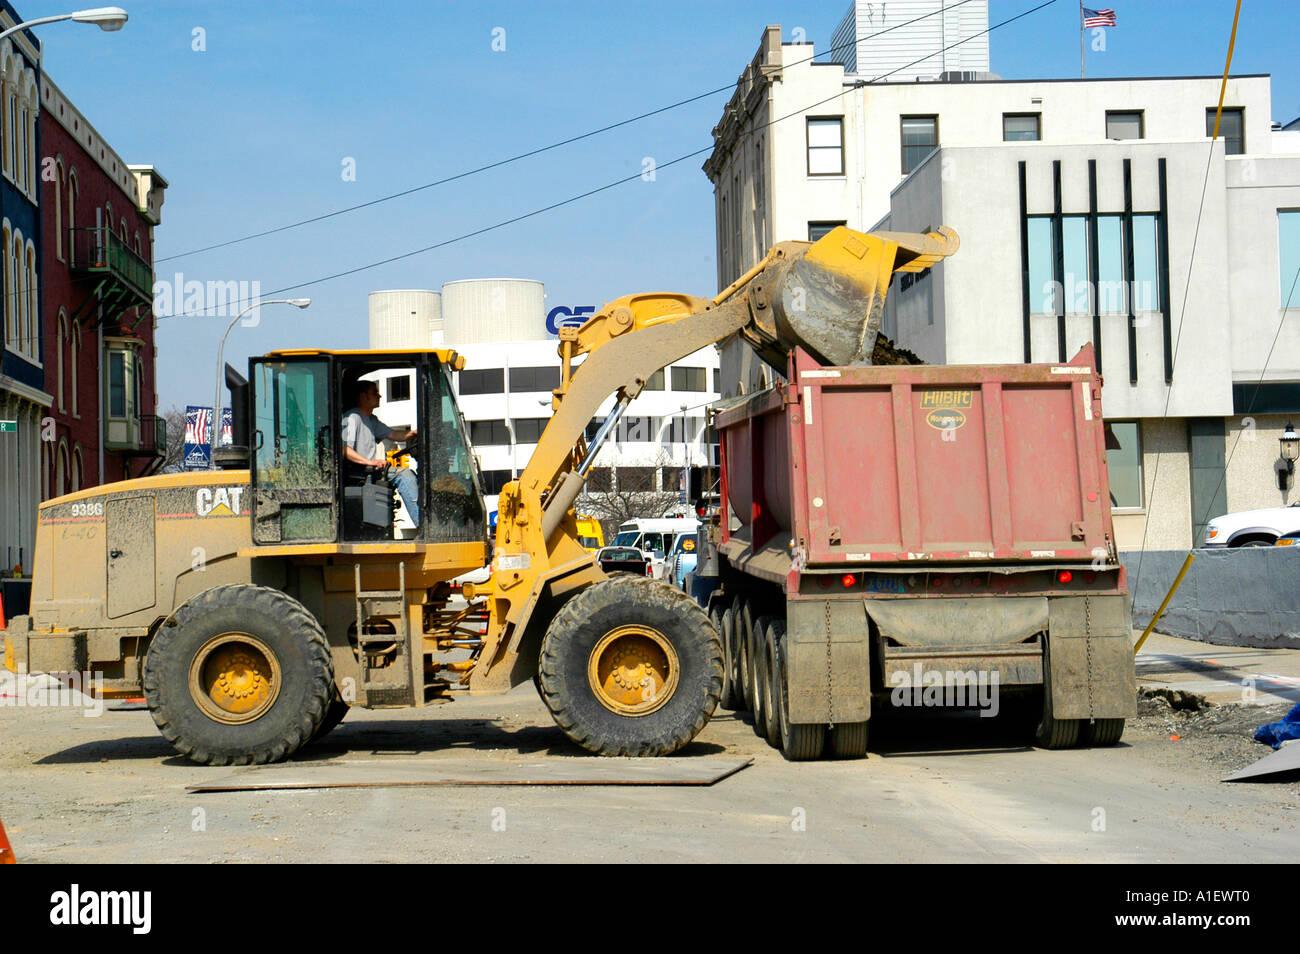 ... excavator use inspection testing u0026 maintenance Array - heavy  equipment manual labor us stock photos u0026 heavy equipment rh alamy com